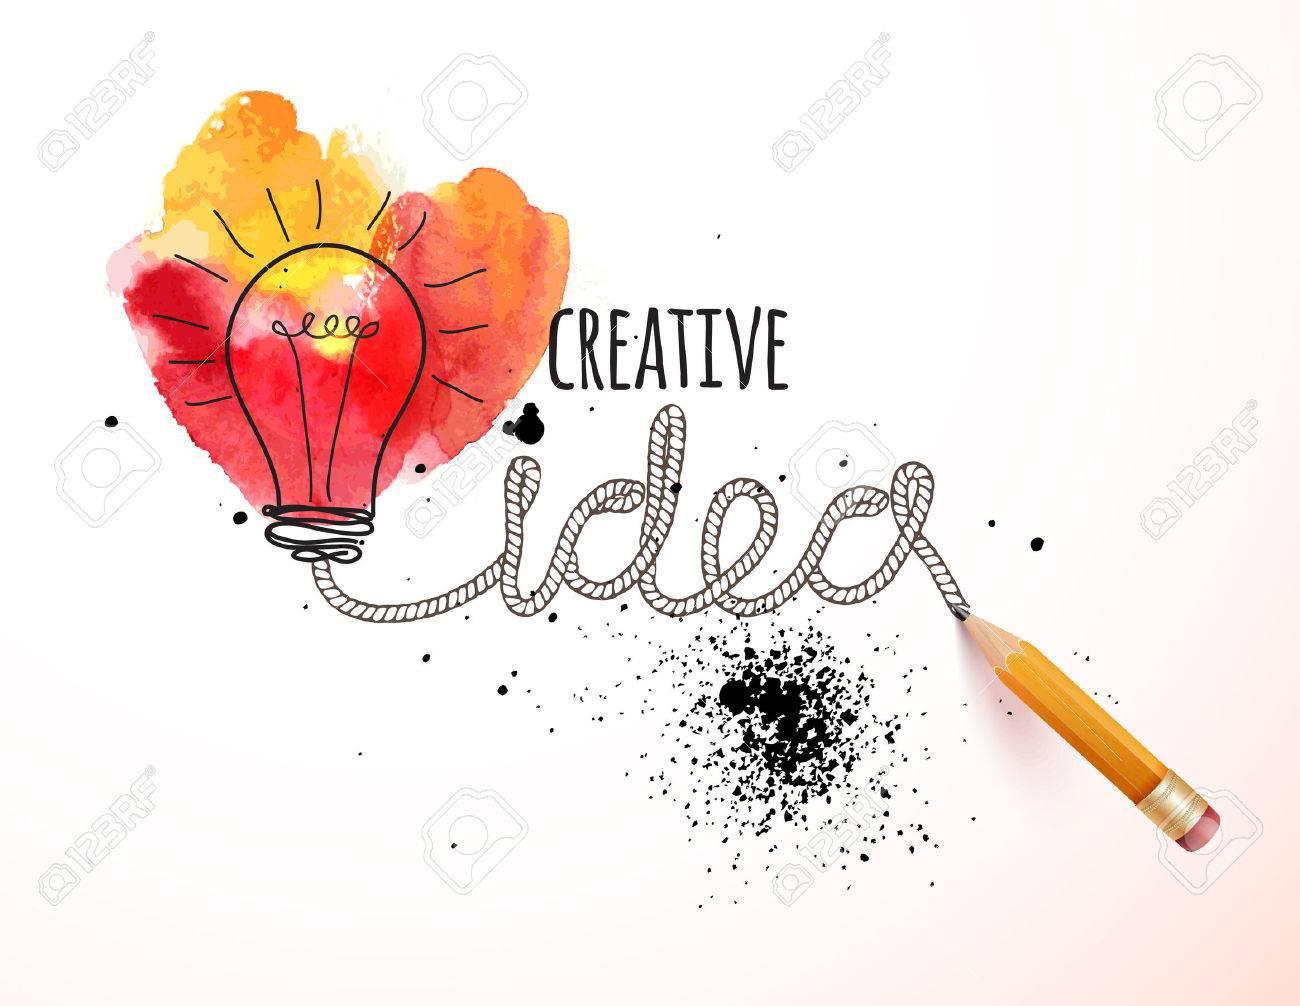 Creative idea loaded, vector concept for inspiration - 45067223